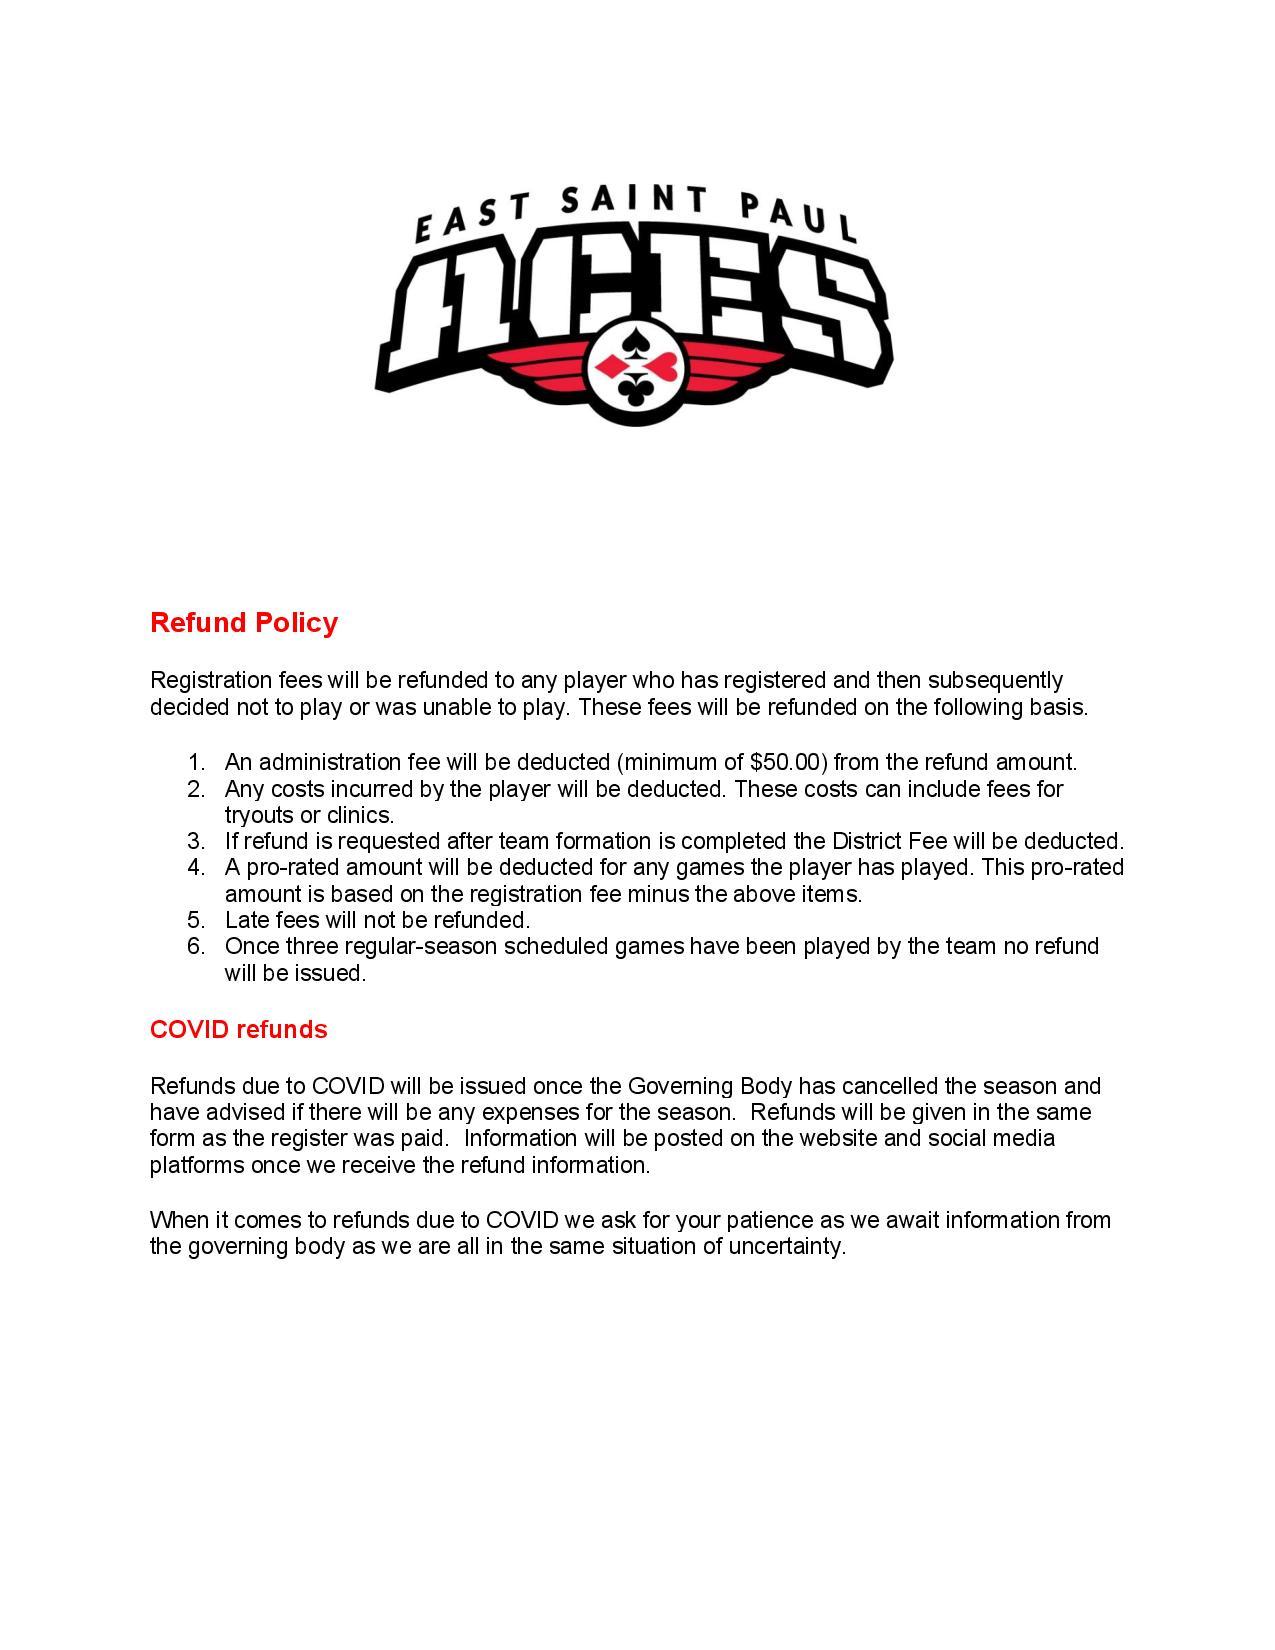 Soccer refund policy